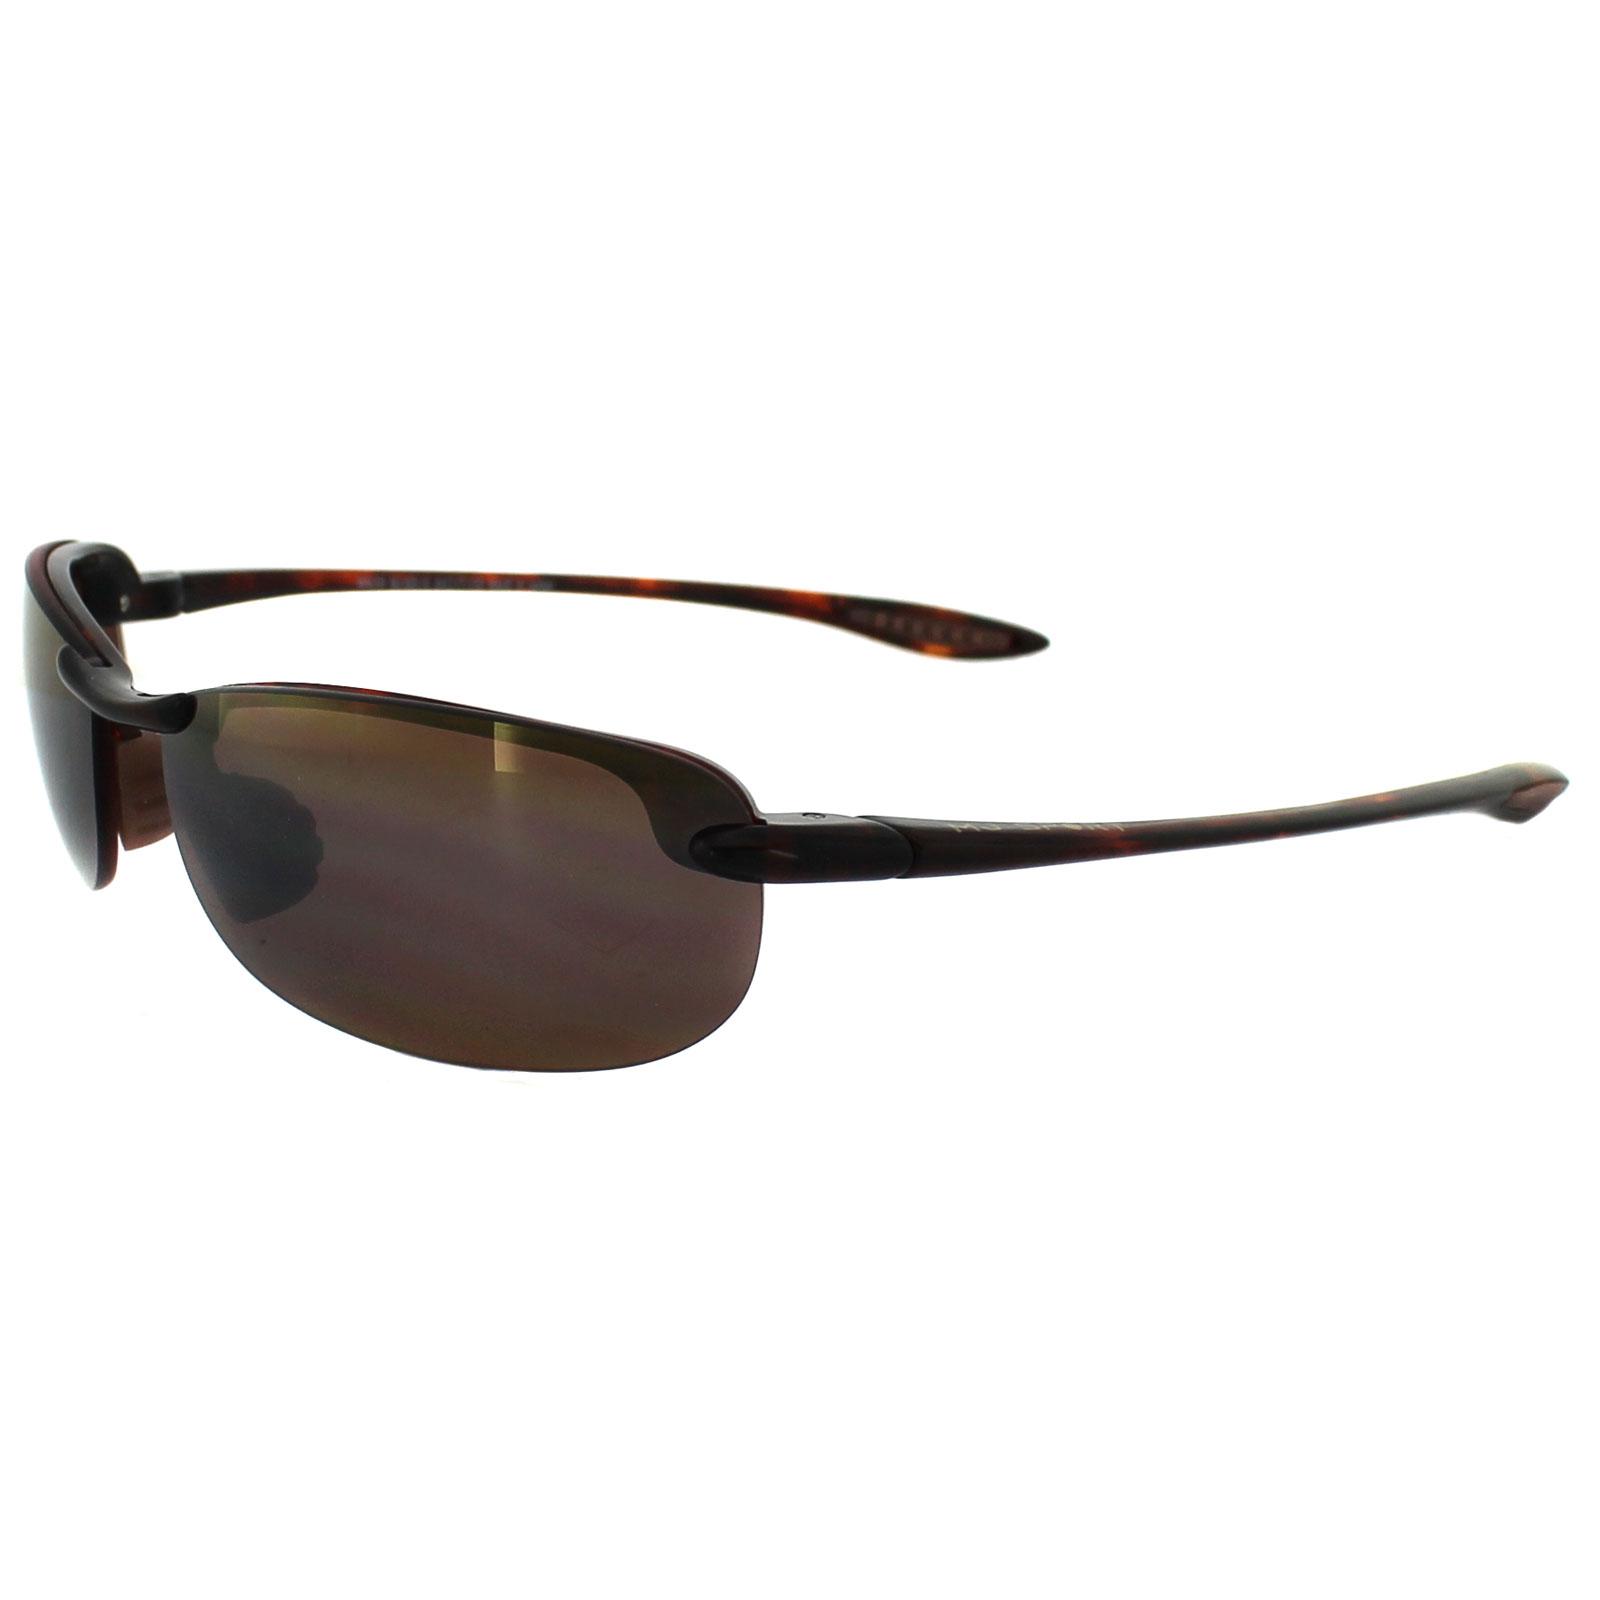 285f99cdc05d Sentinel Maui Jim Sunglasses Makaha H405-10 Tortoise Bronze Polarized